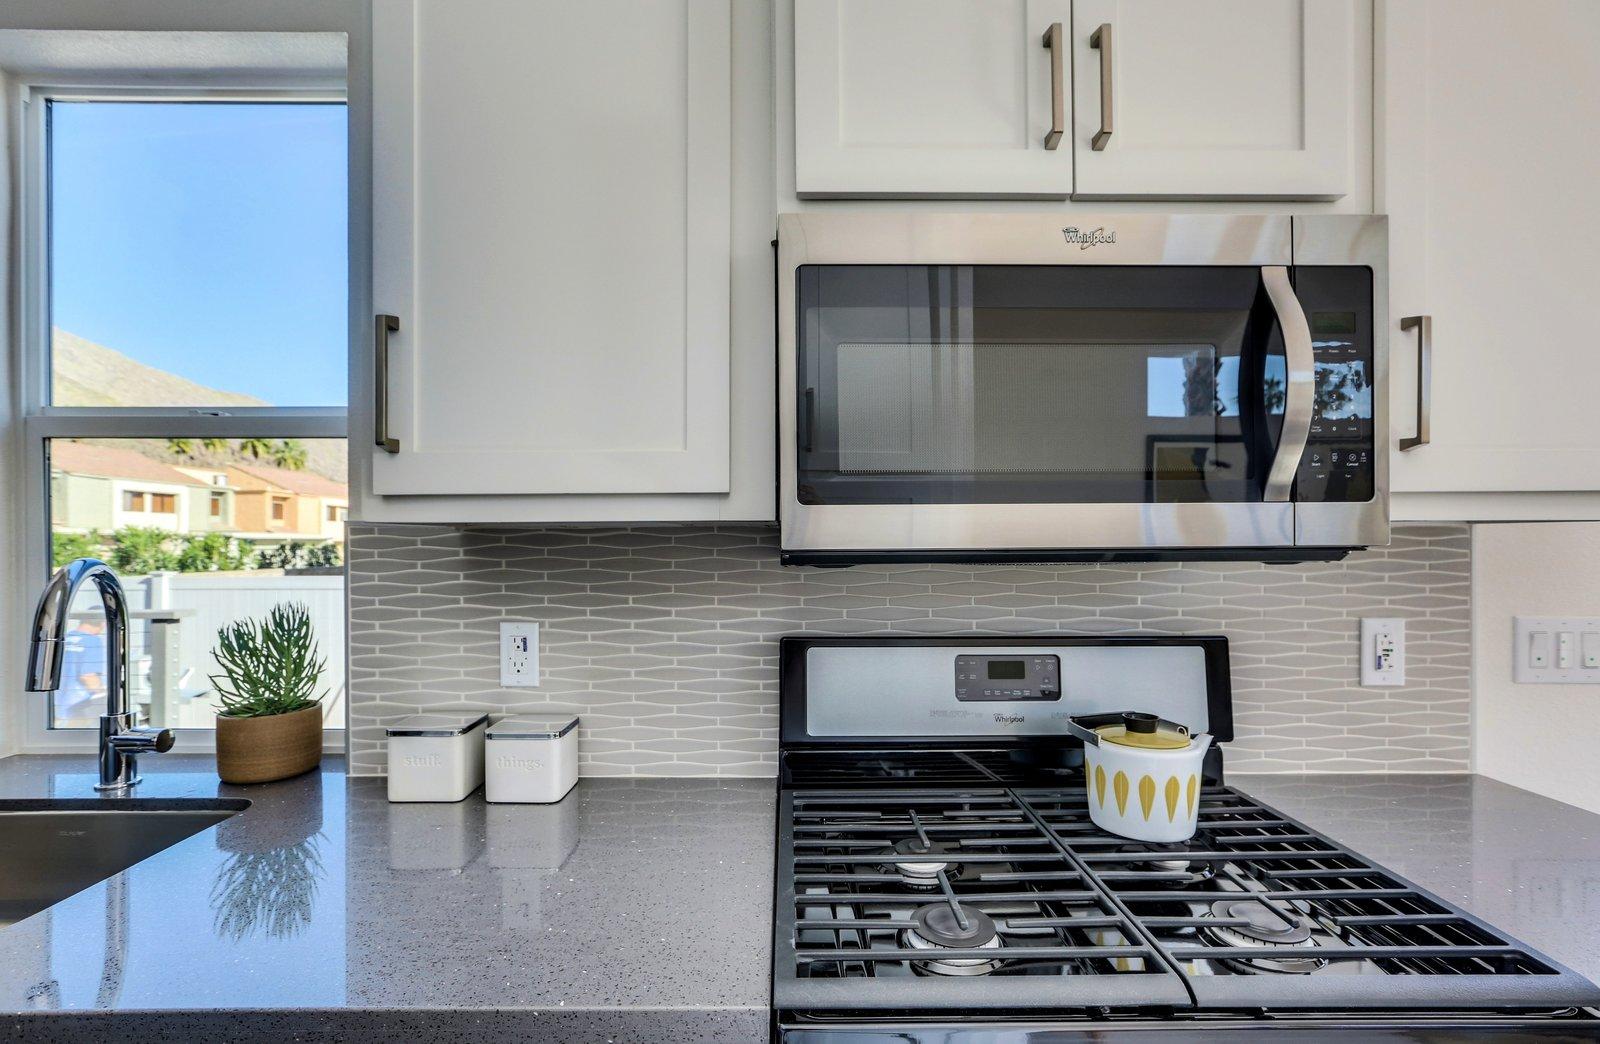 Quartz Counter tops, custom back splash - Palm Canyon Mobile Club  Tiny Homes in Palm Springs